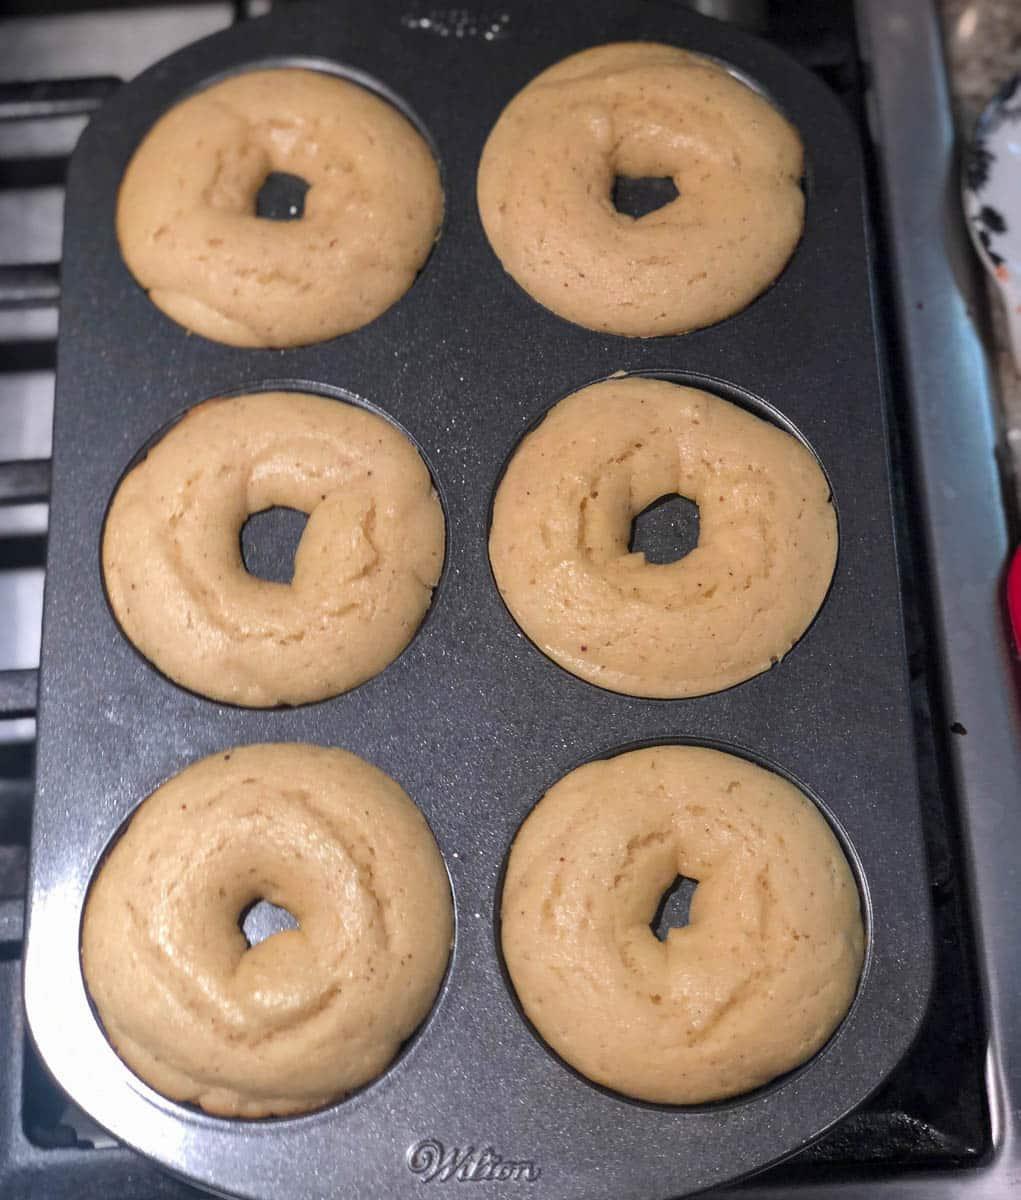 baked donuts chocolate glaze